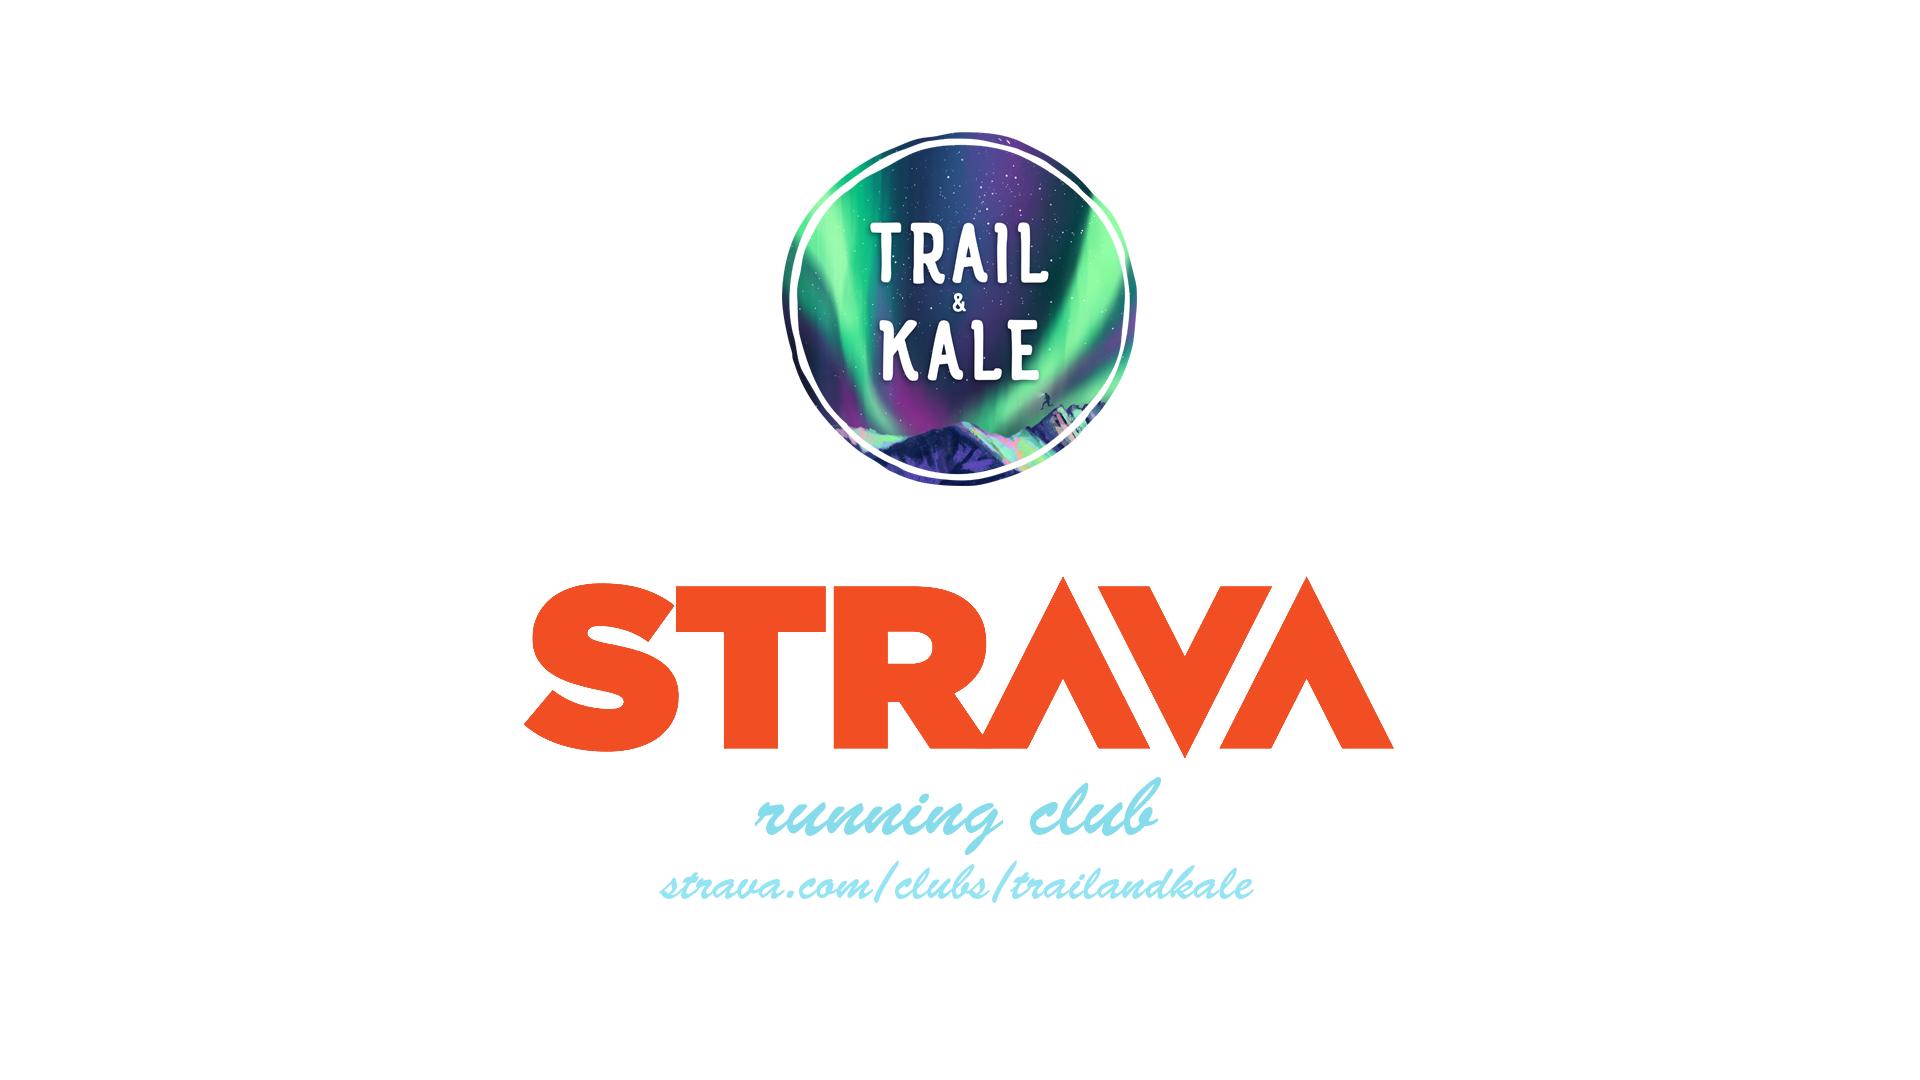 Trail & Kale Strava Running Club